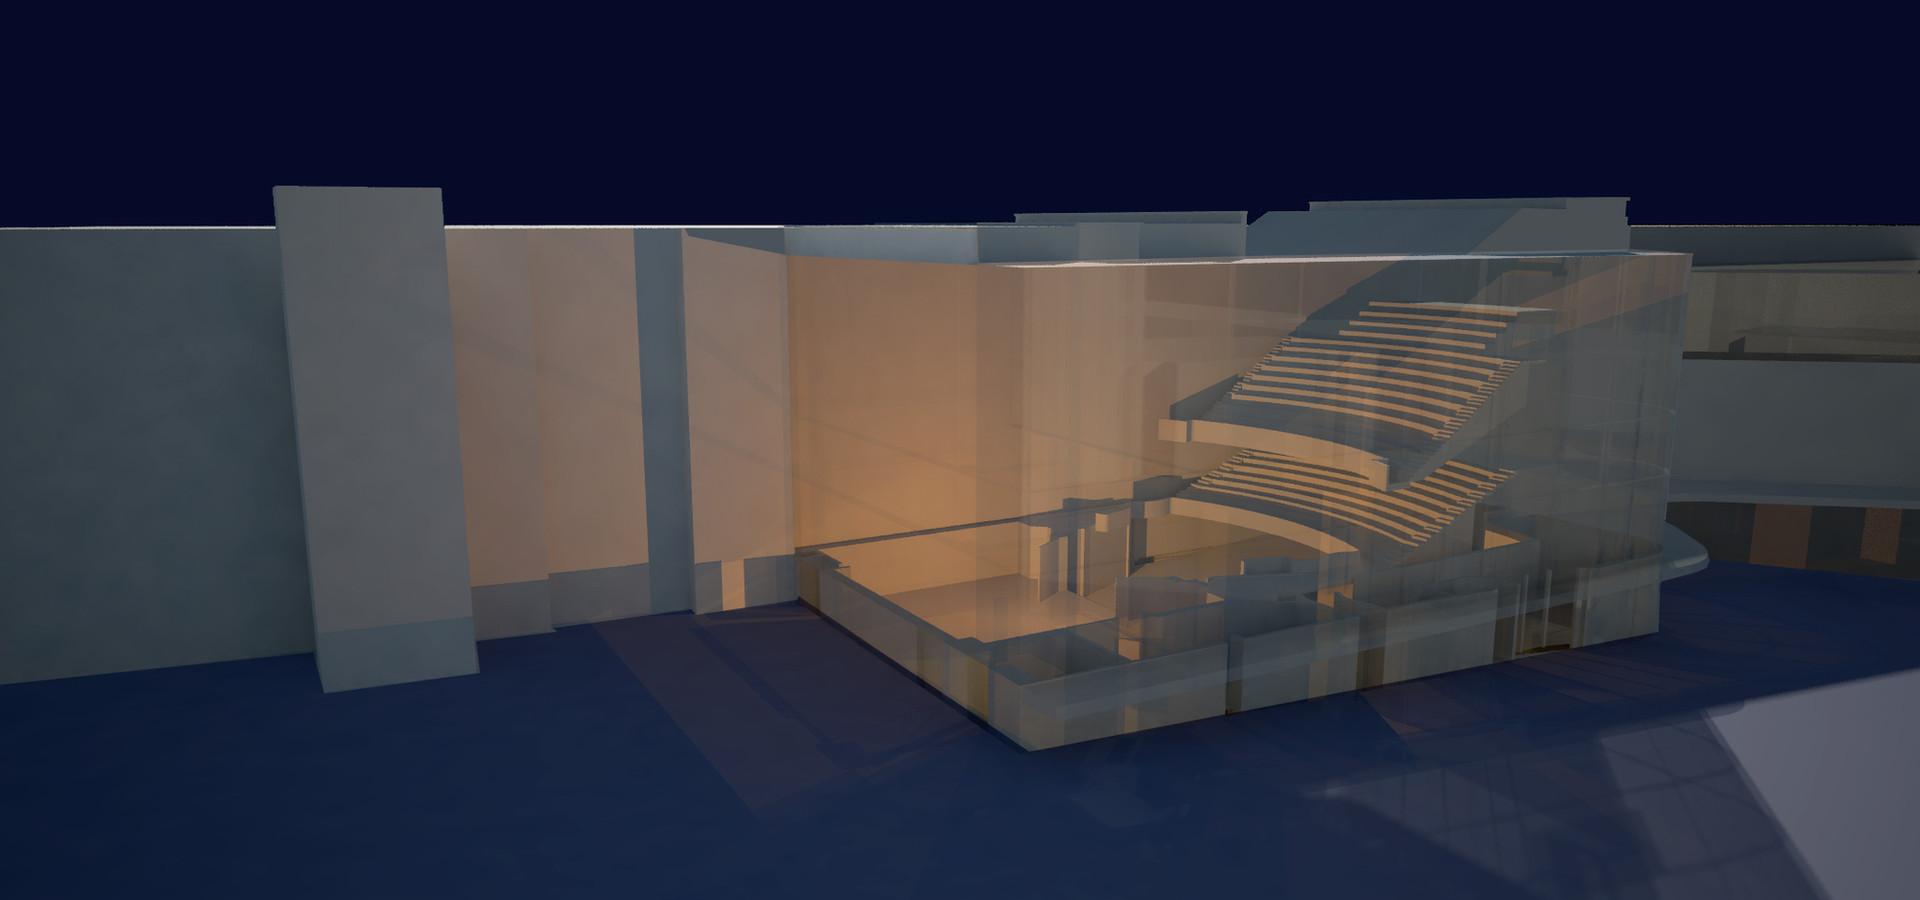 x-ray - existing theatre.jpg